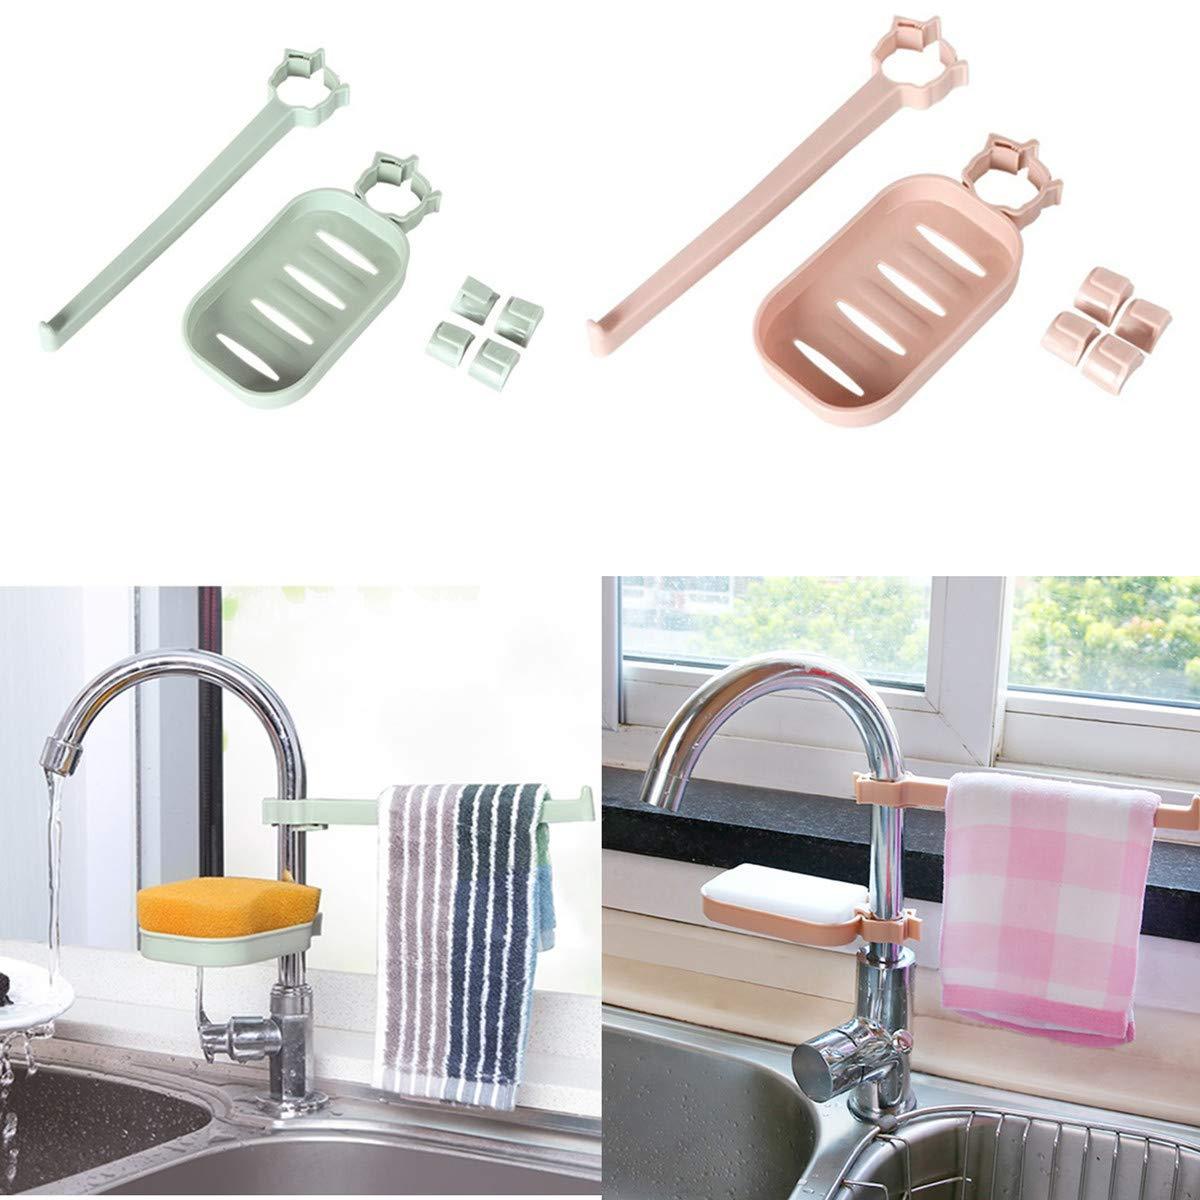 Faucet Drain Storage Racks Alinyf Kitchen Supplies Supplies Sink Sponge Dishcloth Towel Rags Drain Shelf Brush Rack Sink Storage Durable Holder Kitchen Sponge Rags Drying Support- 2Pack